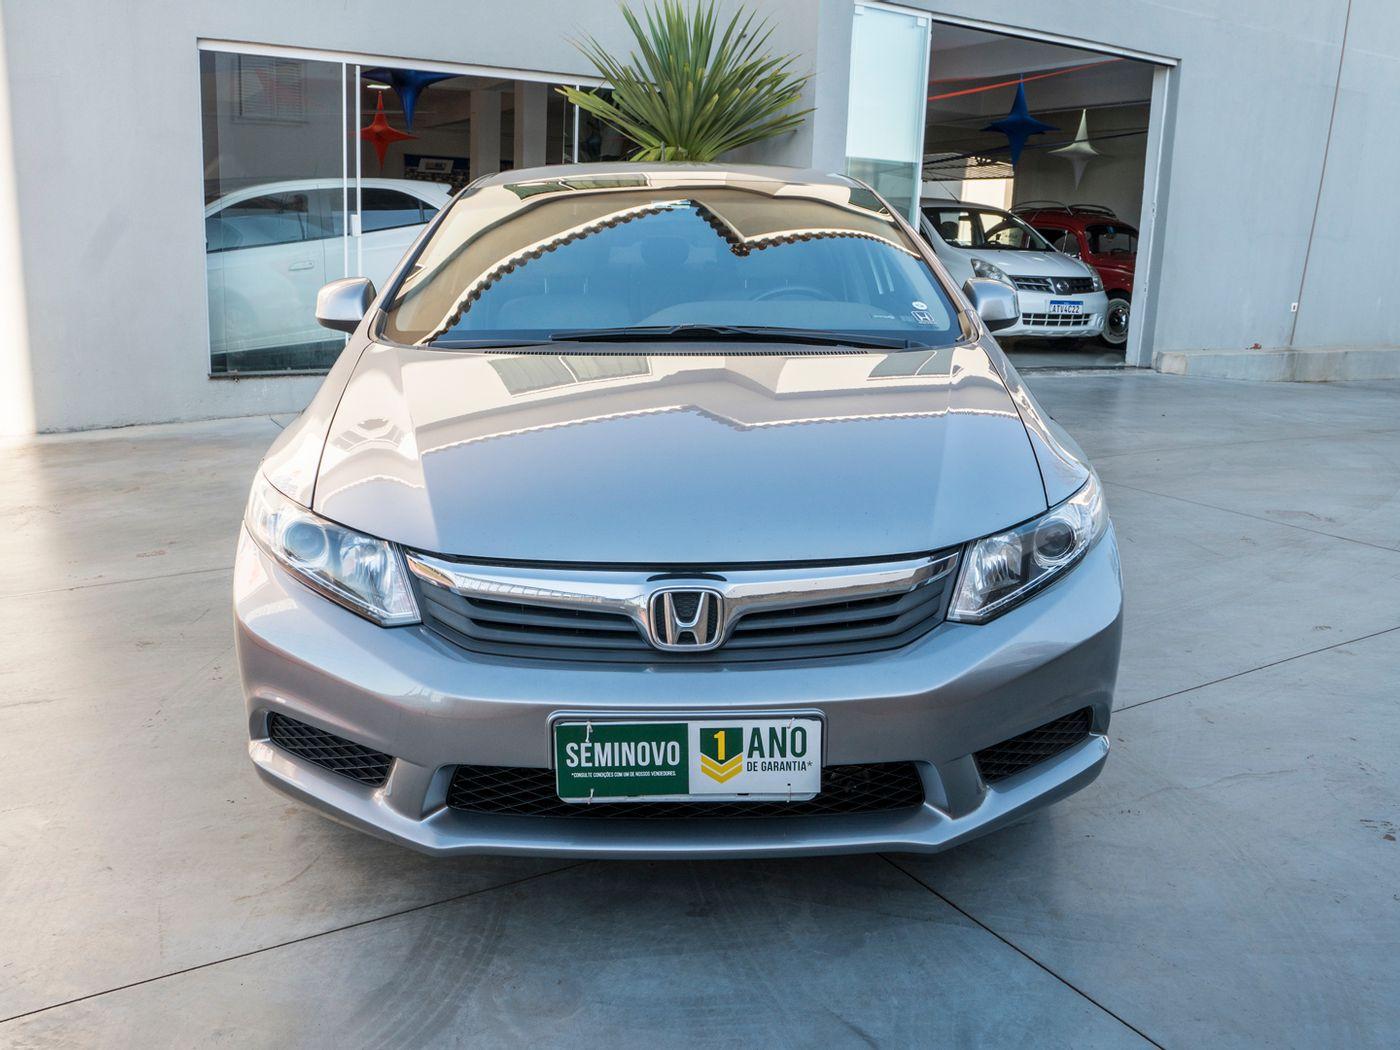 Honda Civic Sedan LXS 1.8/1.8 Flex 16V Aut. 4p